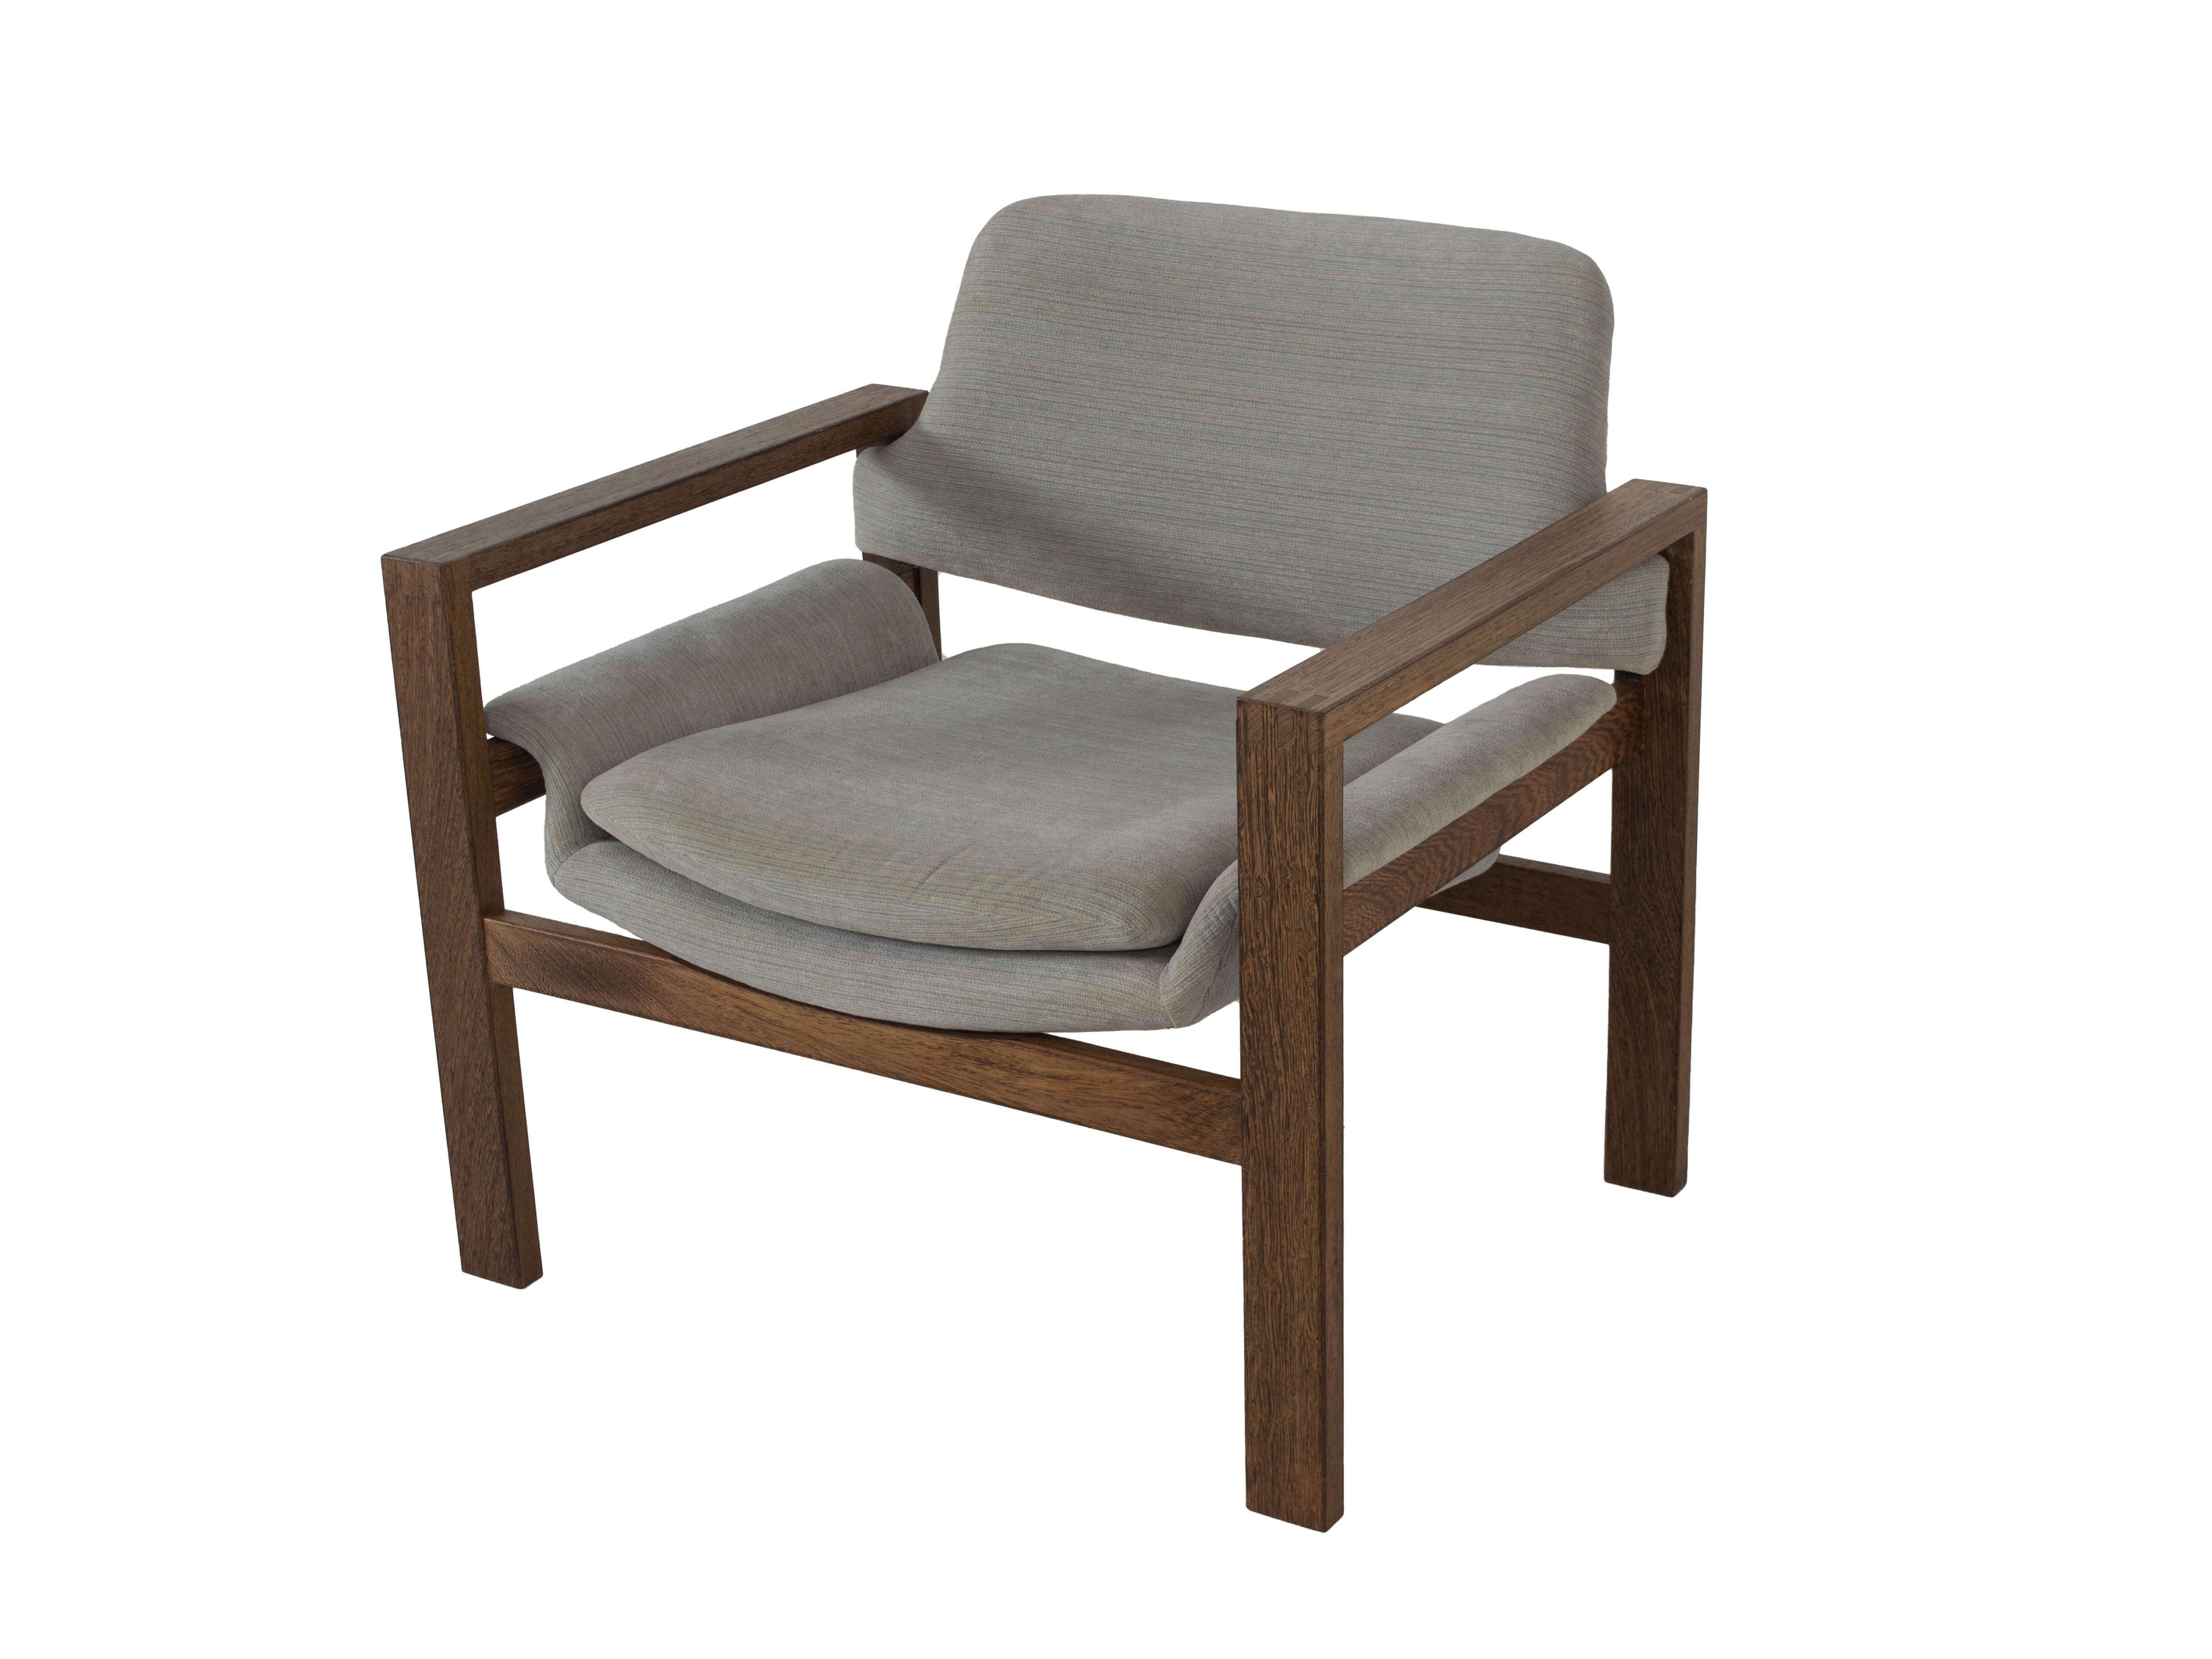 Arm Chair Attributed to Martin Visser 't Spectrum, The Netherlands